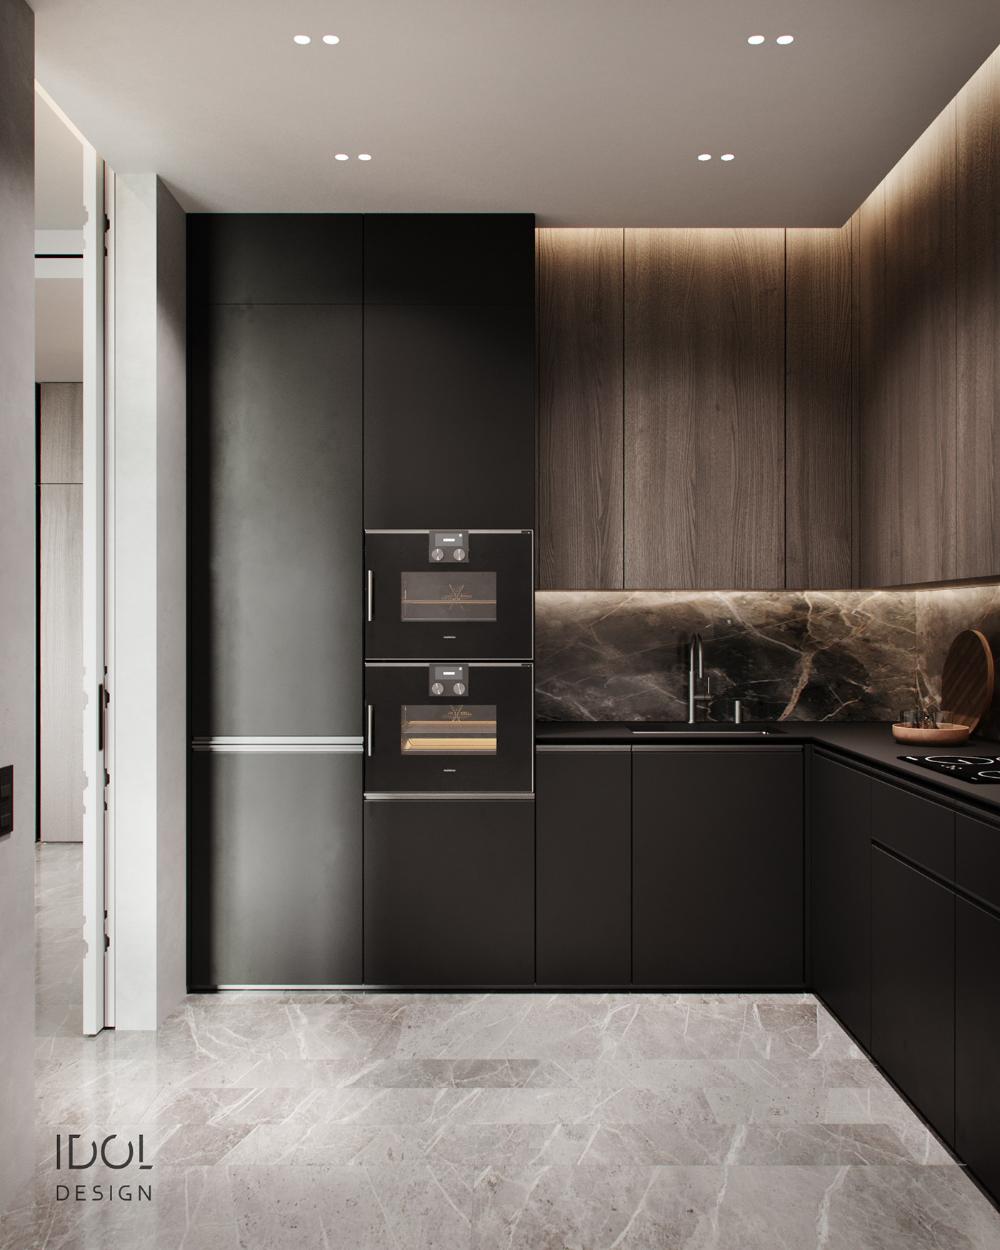 Modern Interior Design projects